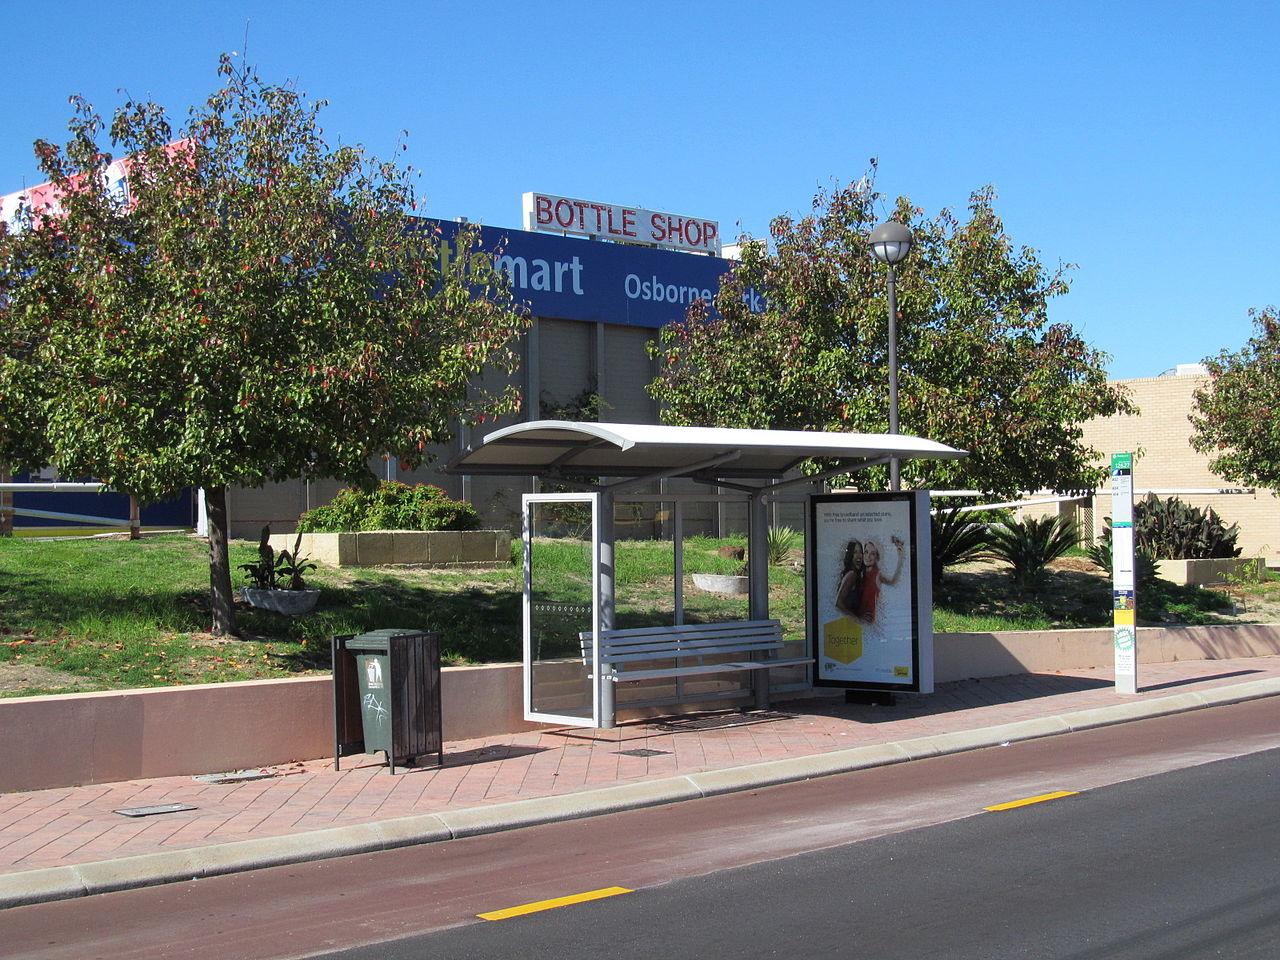 file oic osborne park tram stop wikimedia commons. Black Bedroom Furniture Sets. Home Design Ideas